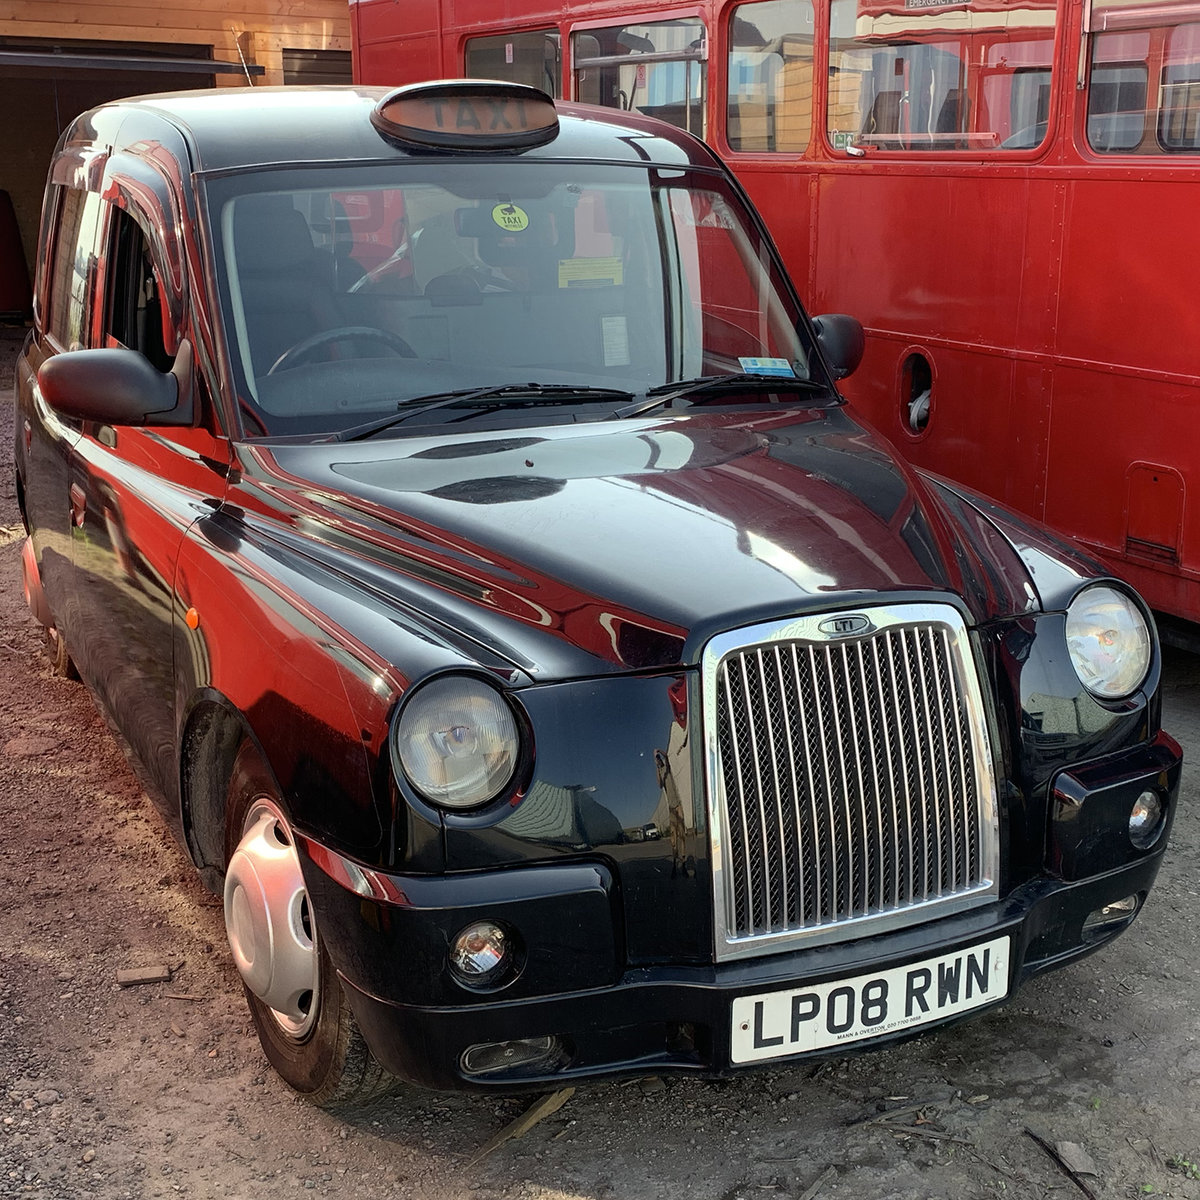 Picture of 2008 LTI TX4 London Black Cab, Rare 7 seater For Sale